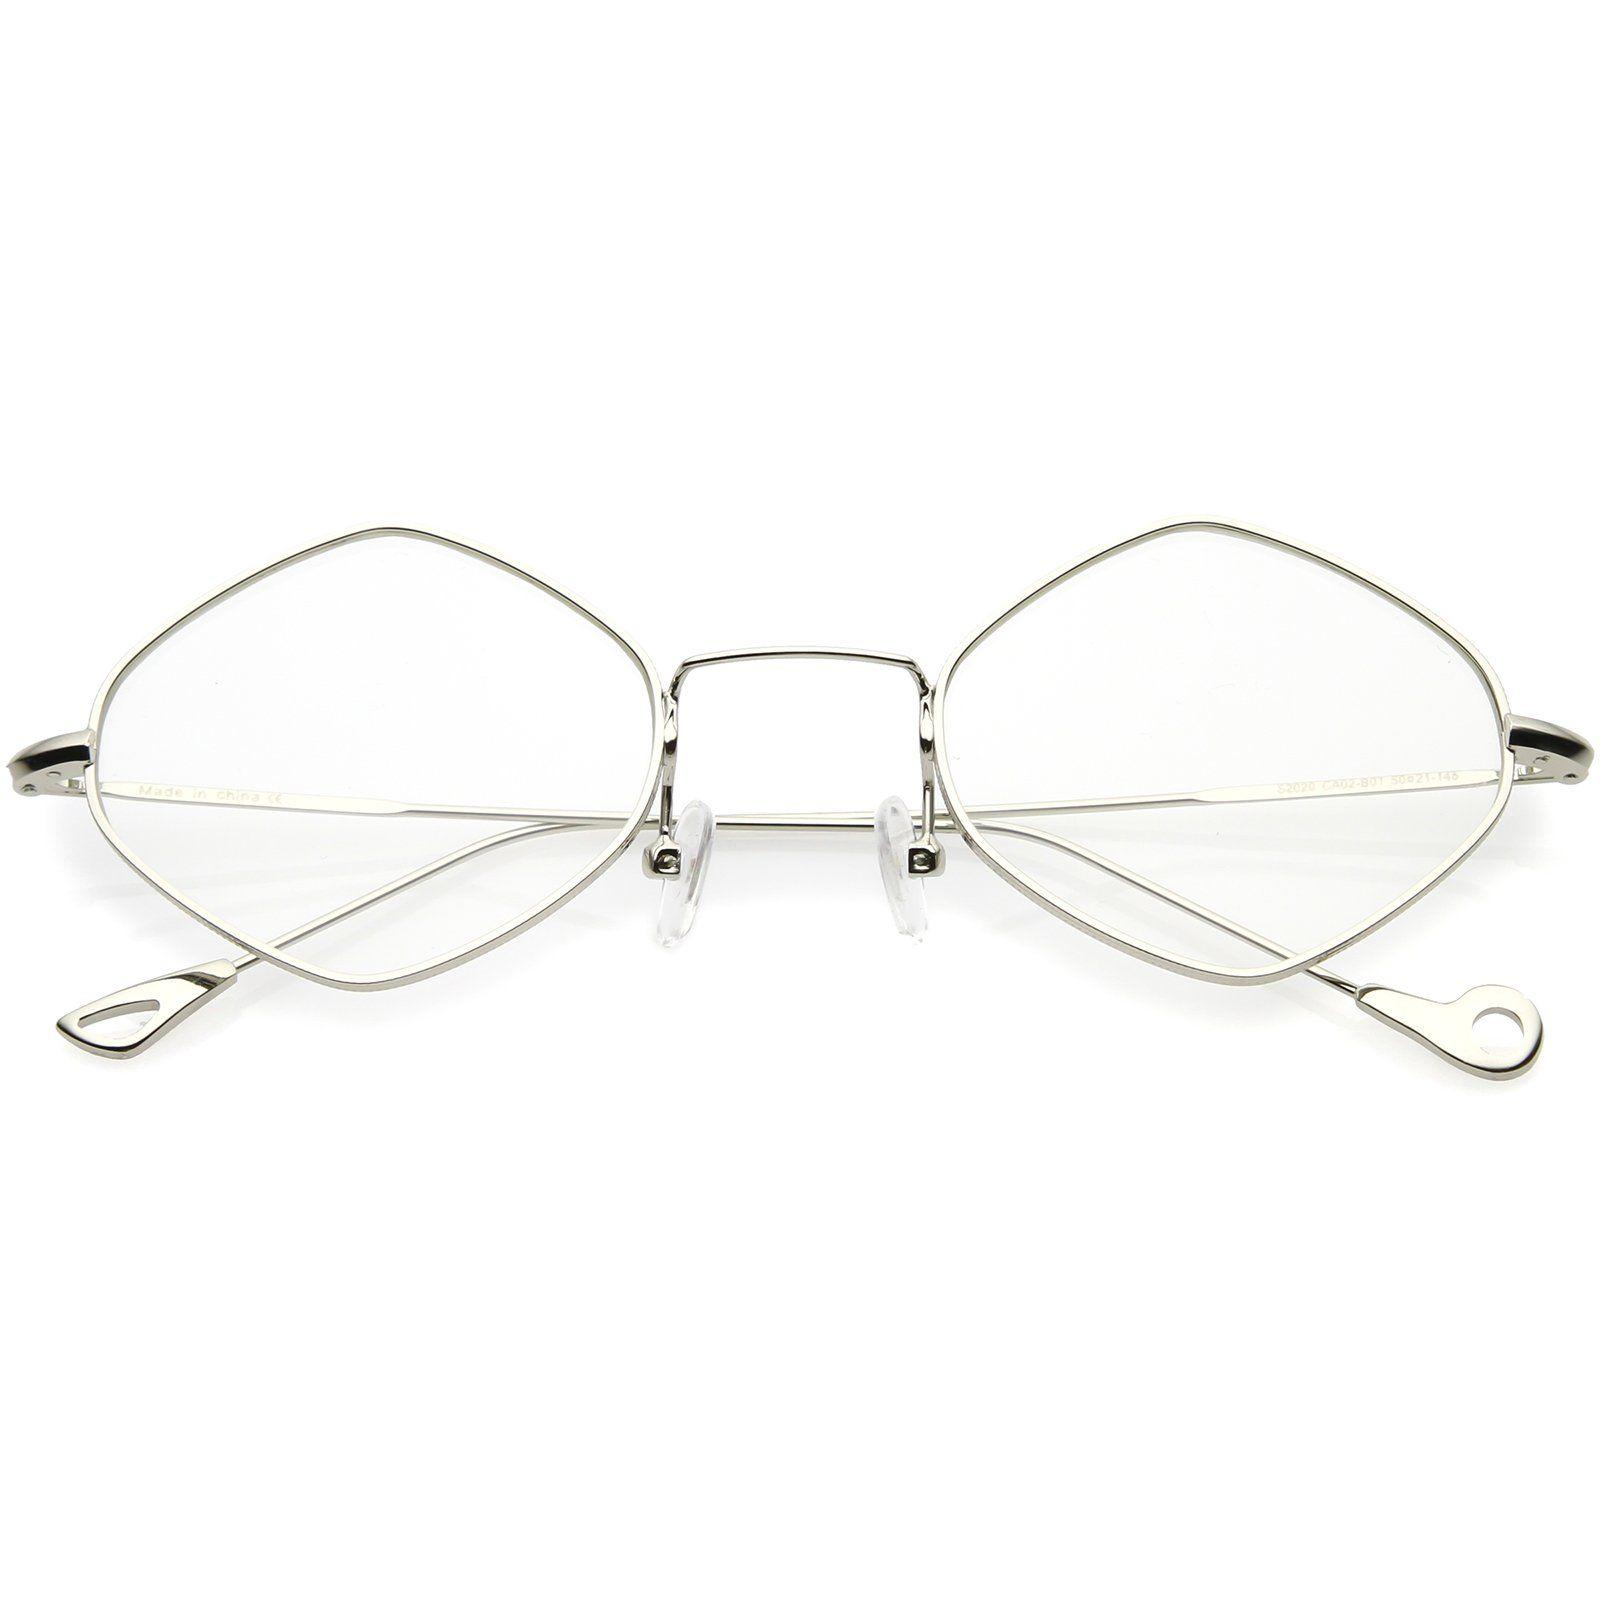 c54b61031f Premium Small Metal Diamond Eyeglasses Ultra Slim Arms Color Tinted Flat  Lens 51mm